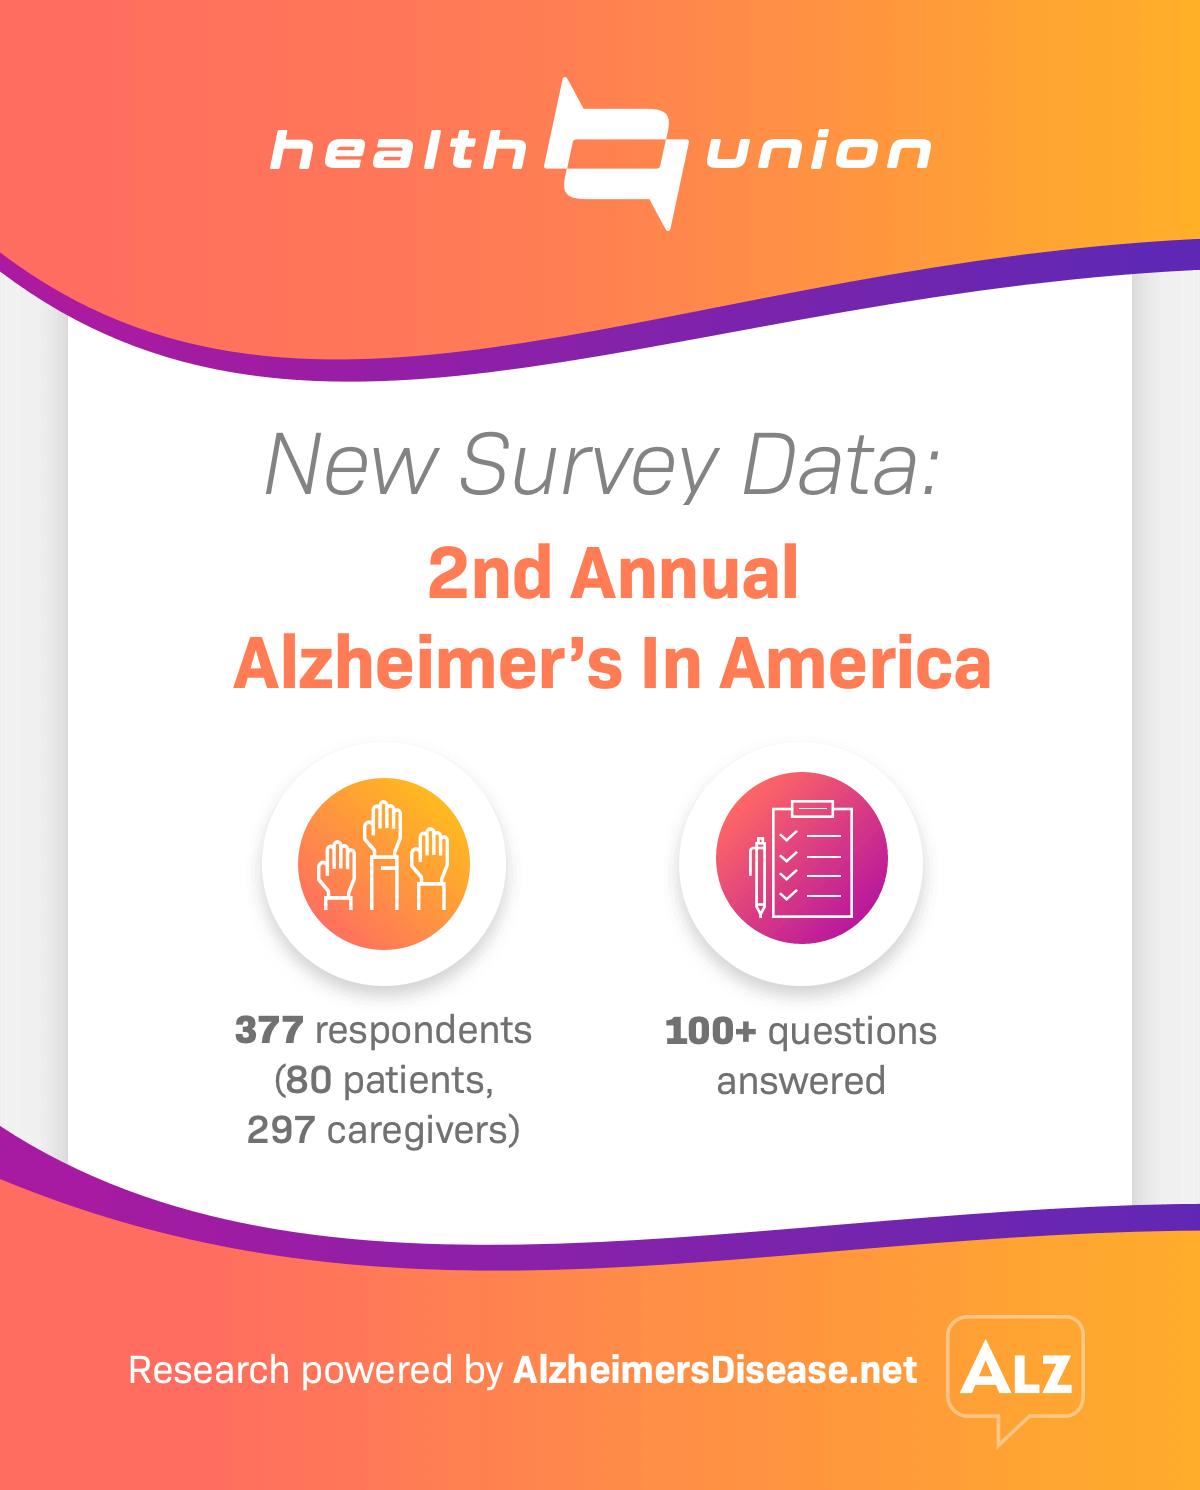 Alzheimer's disease patient data